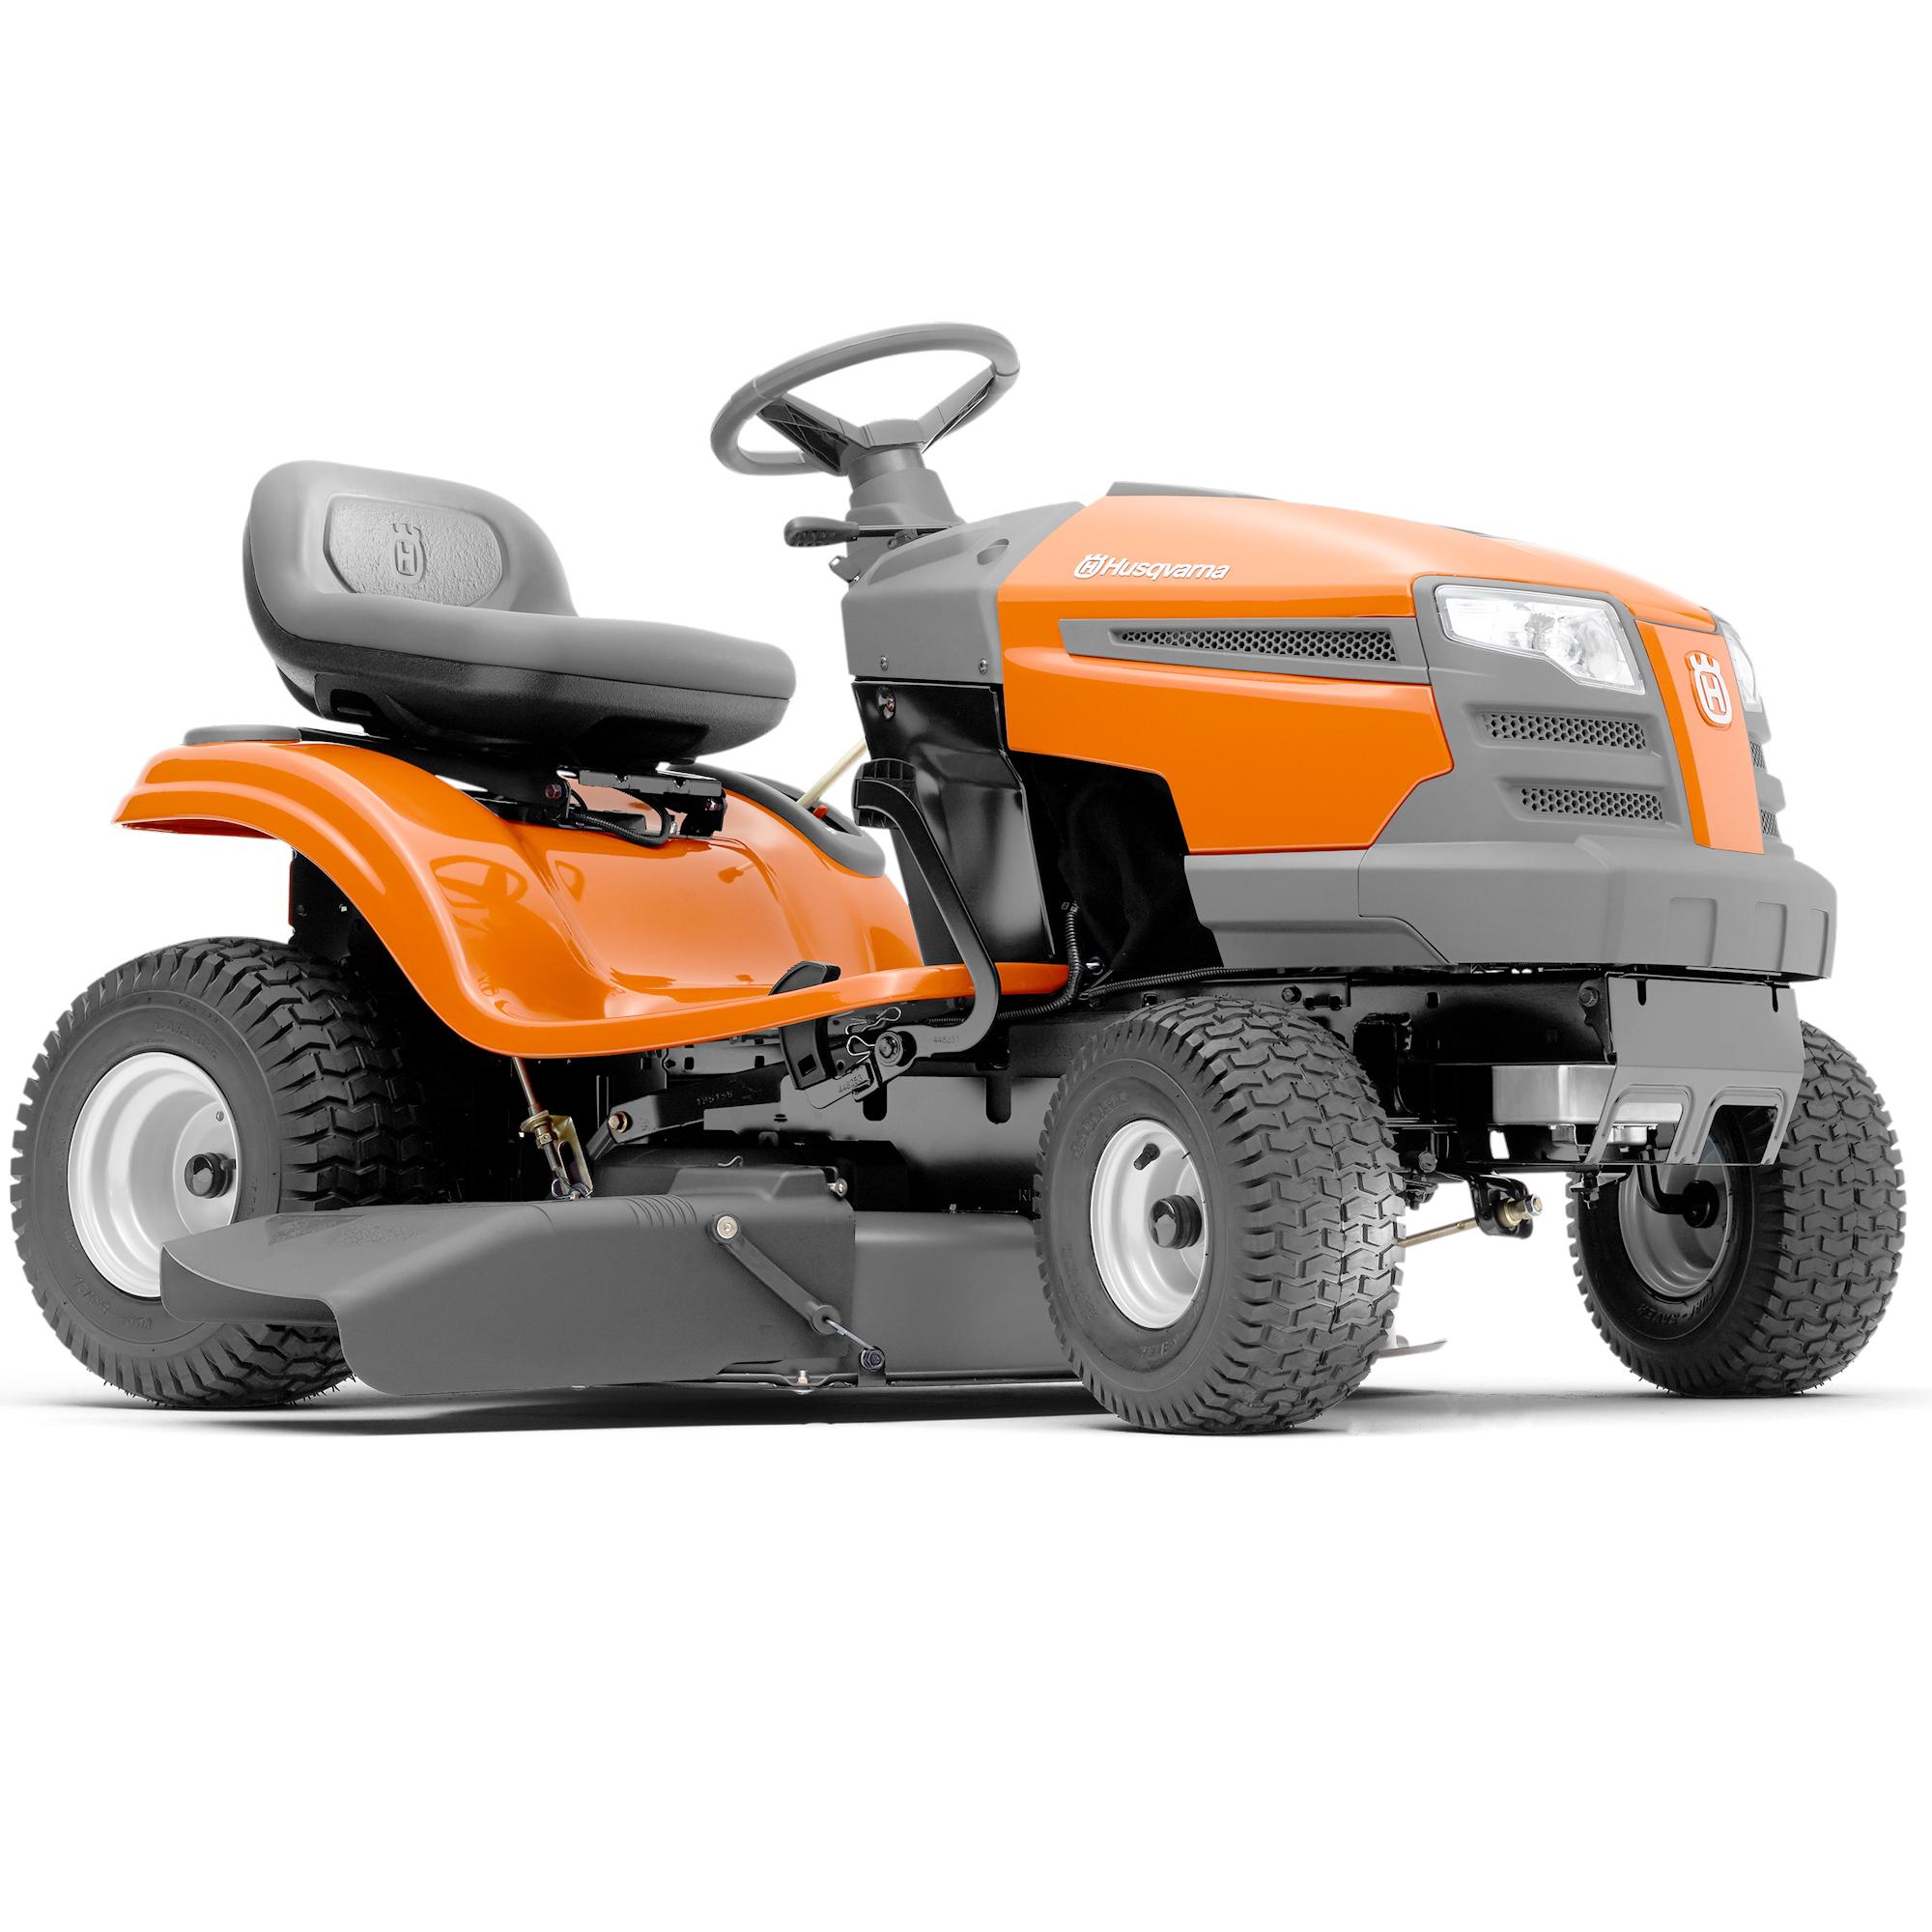 Husqvarna Ts138 Garden Tractor Large Collector